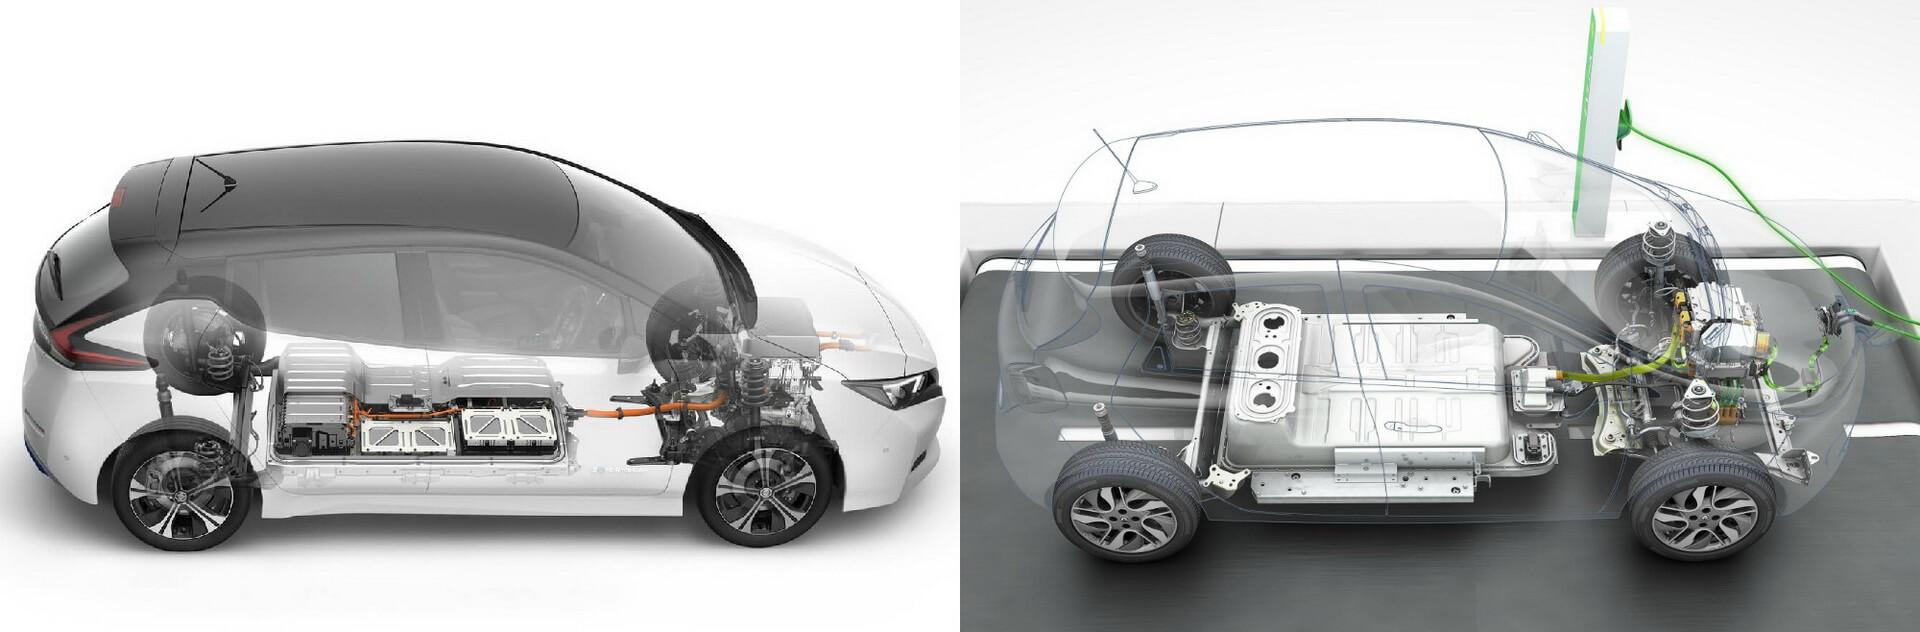 Трансмиссия Nissan Leaf иRenault ZOE